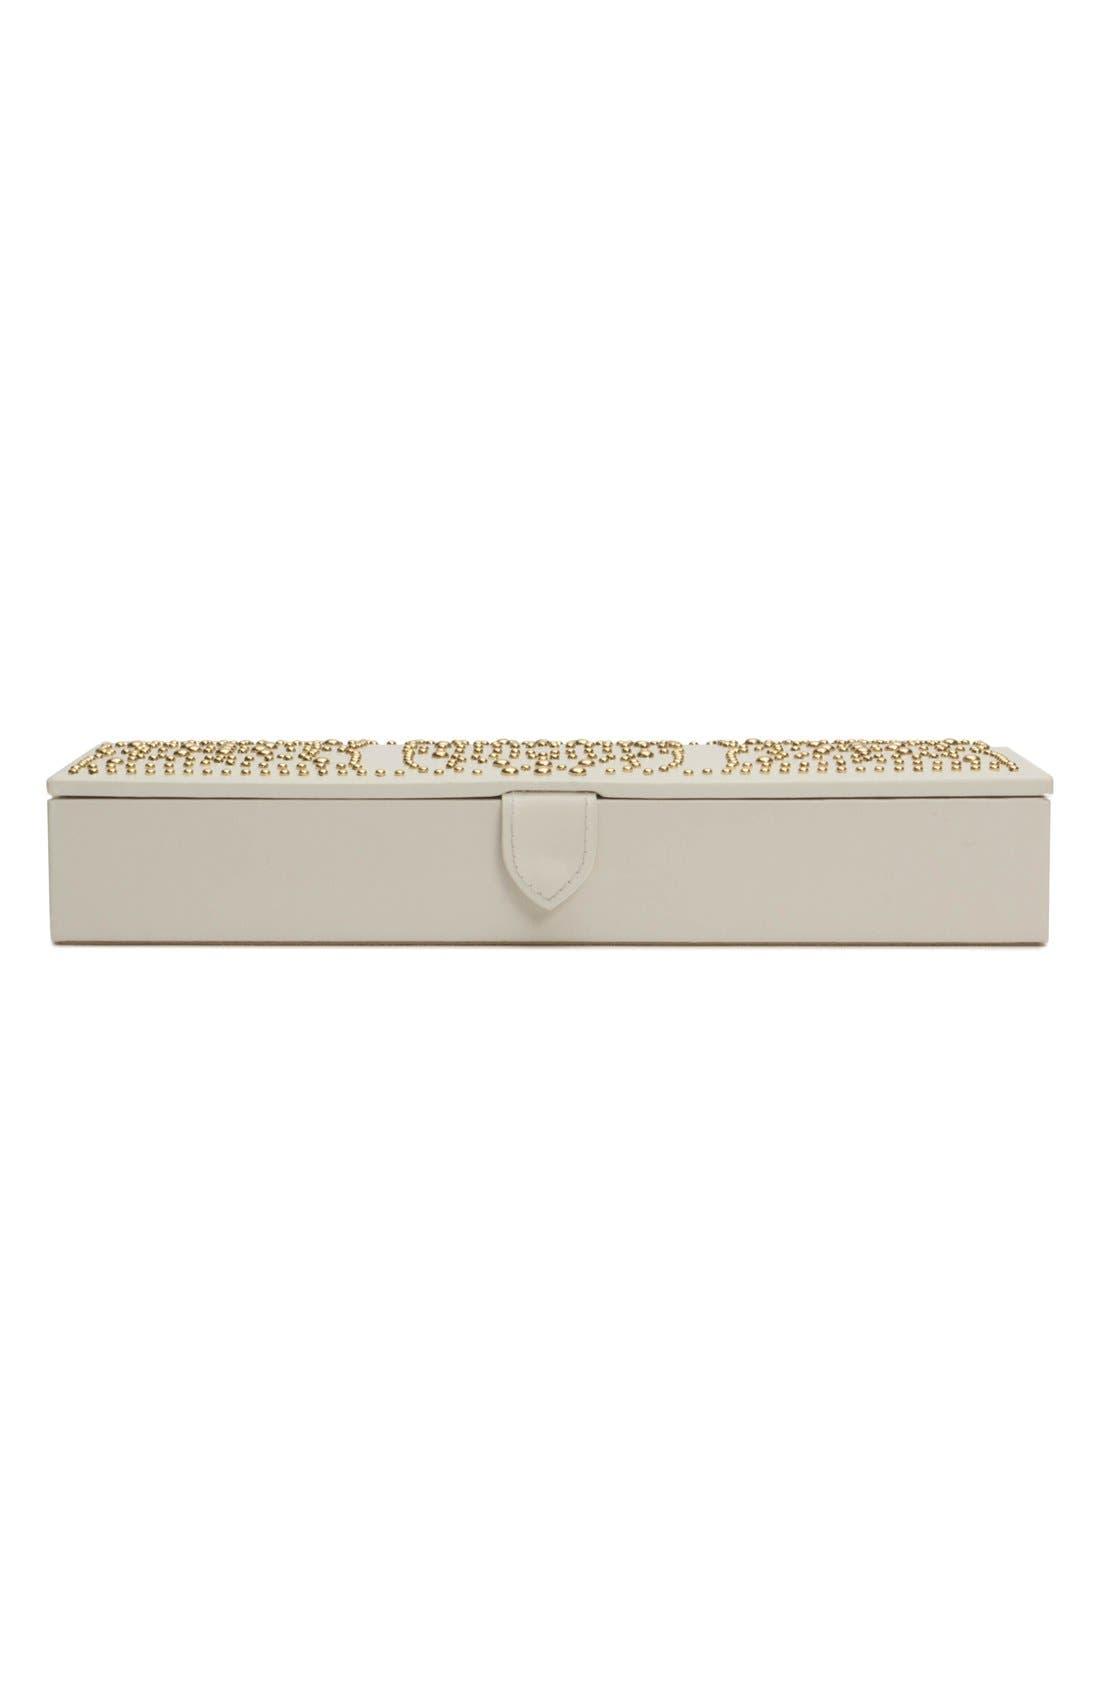 'Marrakesh' Jewelry Box,                             Alternate thumbnail 4, color,                             Cream